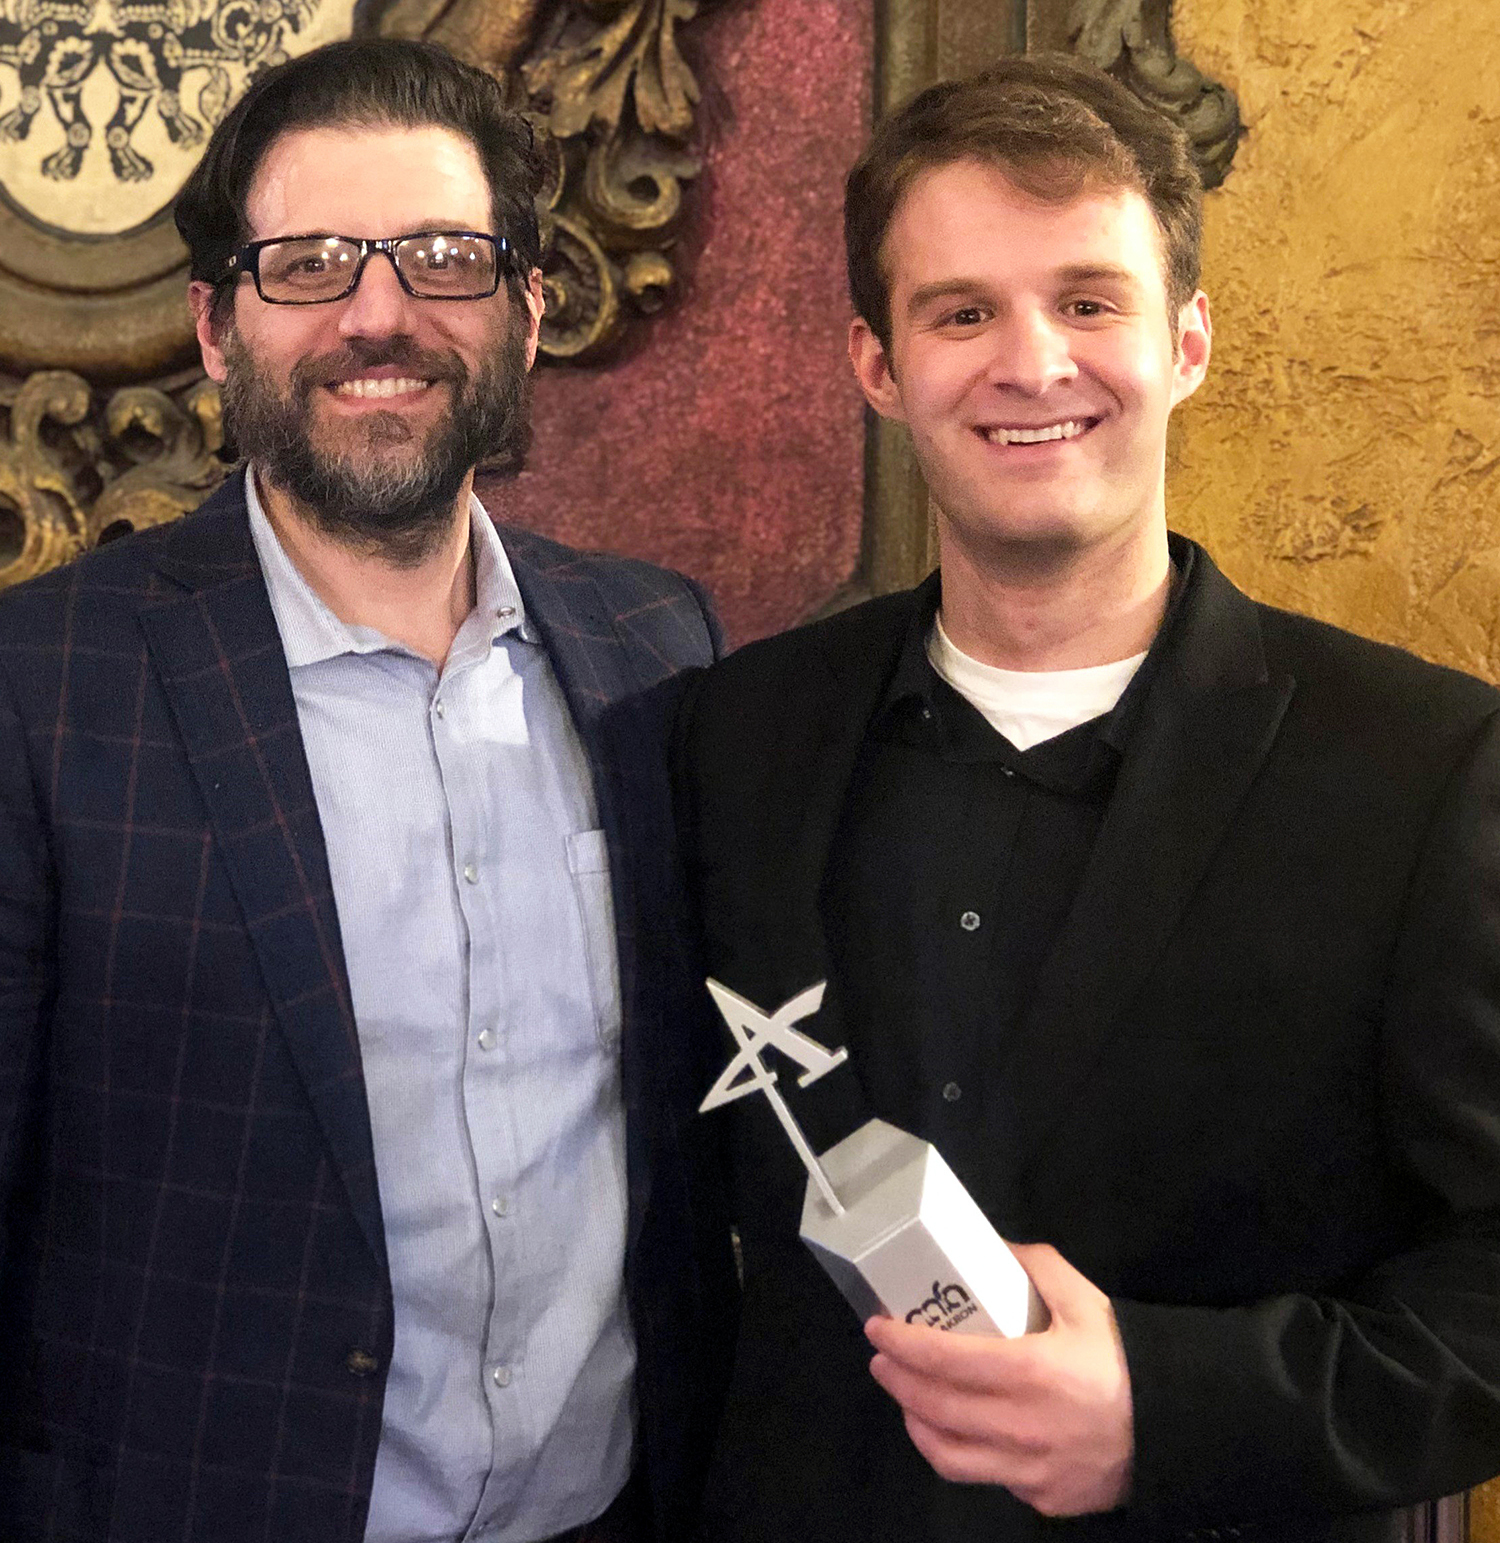 Mario ricciardi silver addy award crop219